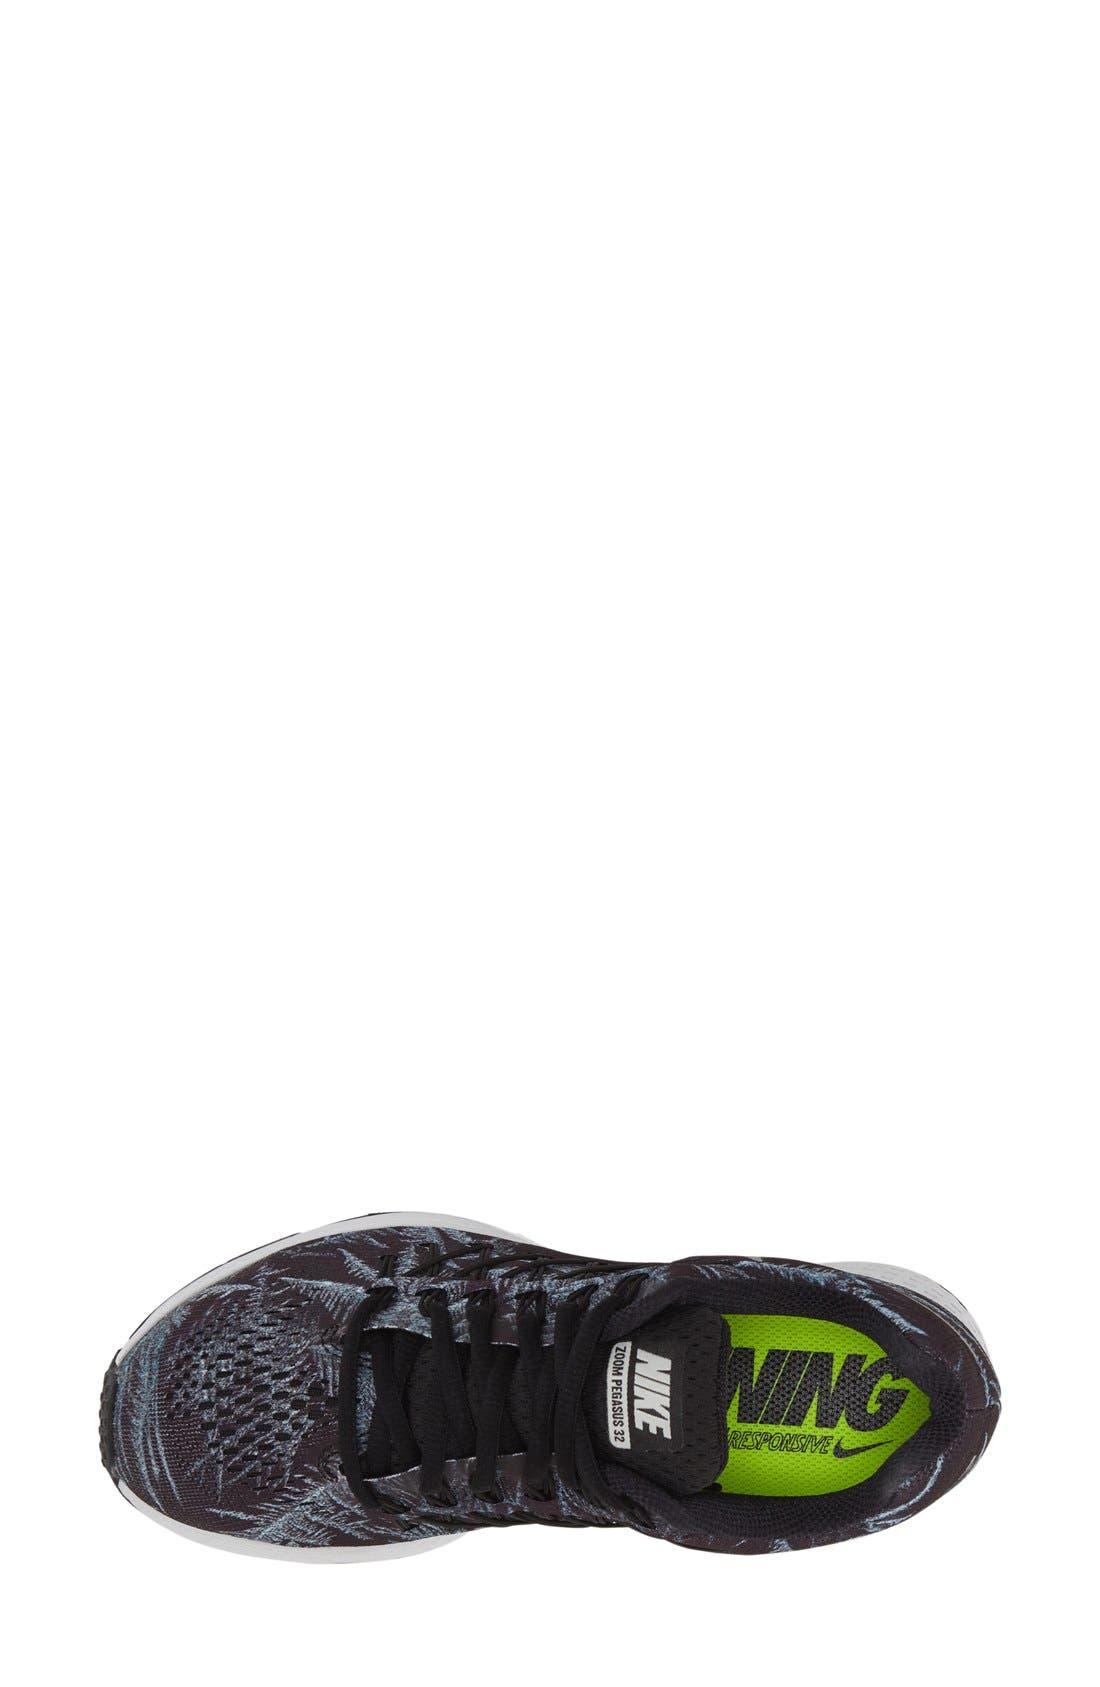 Alternate Image 3  - Nike 'Air Zoom Pegasus 32 Solstice' Running Shoe (Women)